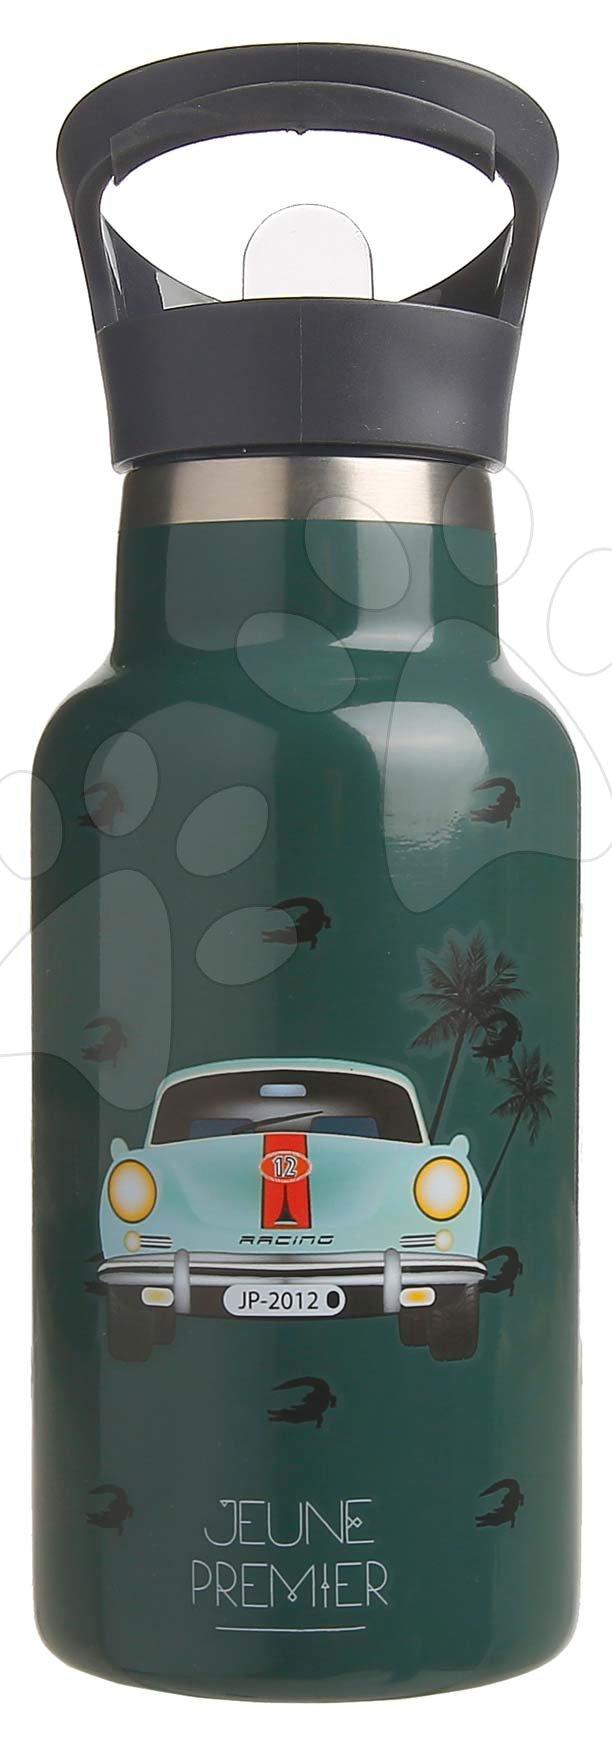 Školská fľaša na vodu Drinking Bottle Monte Carlo Jeune Premier ergonomická luxusné prevedenie 17*7 cm